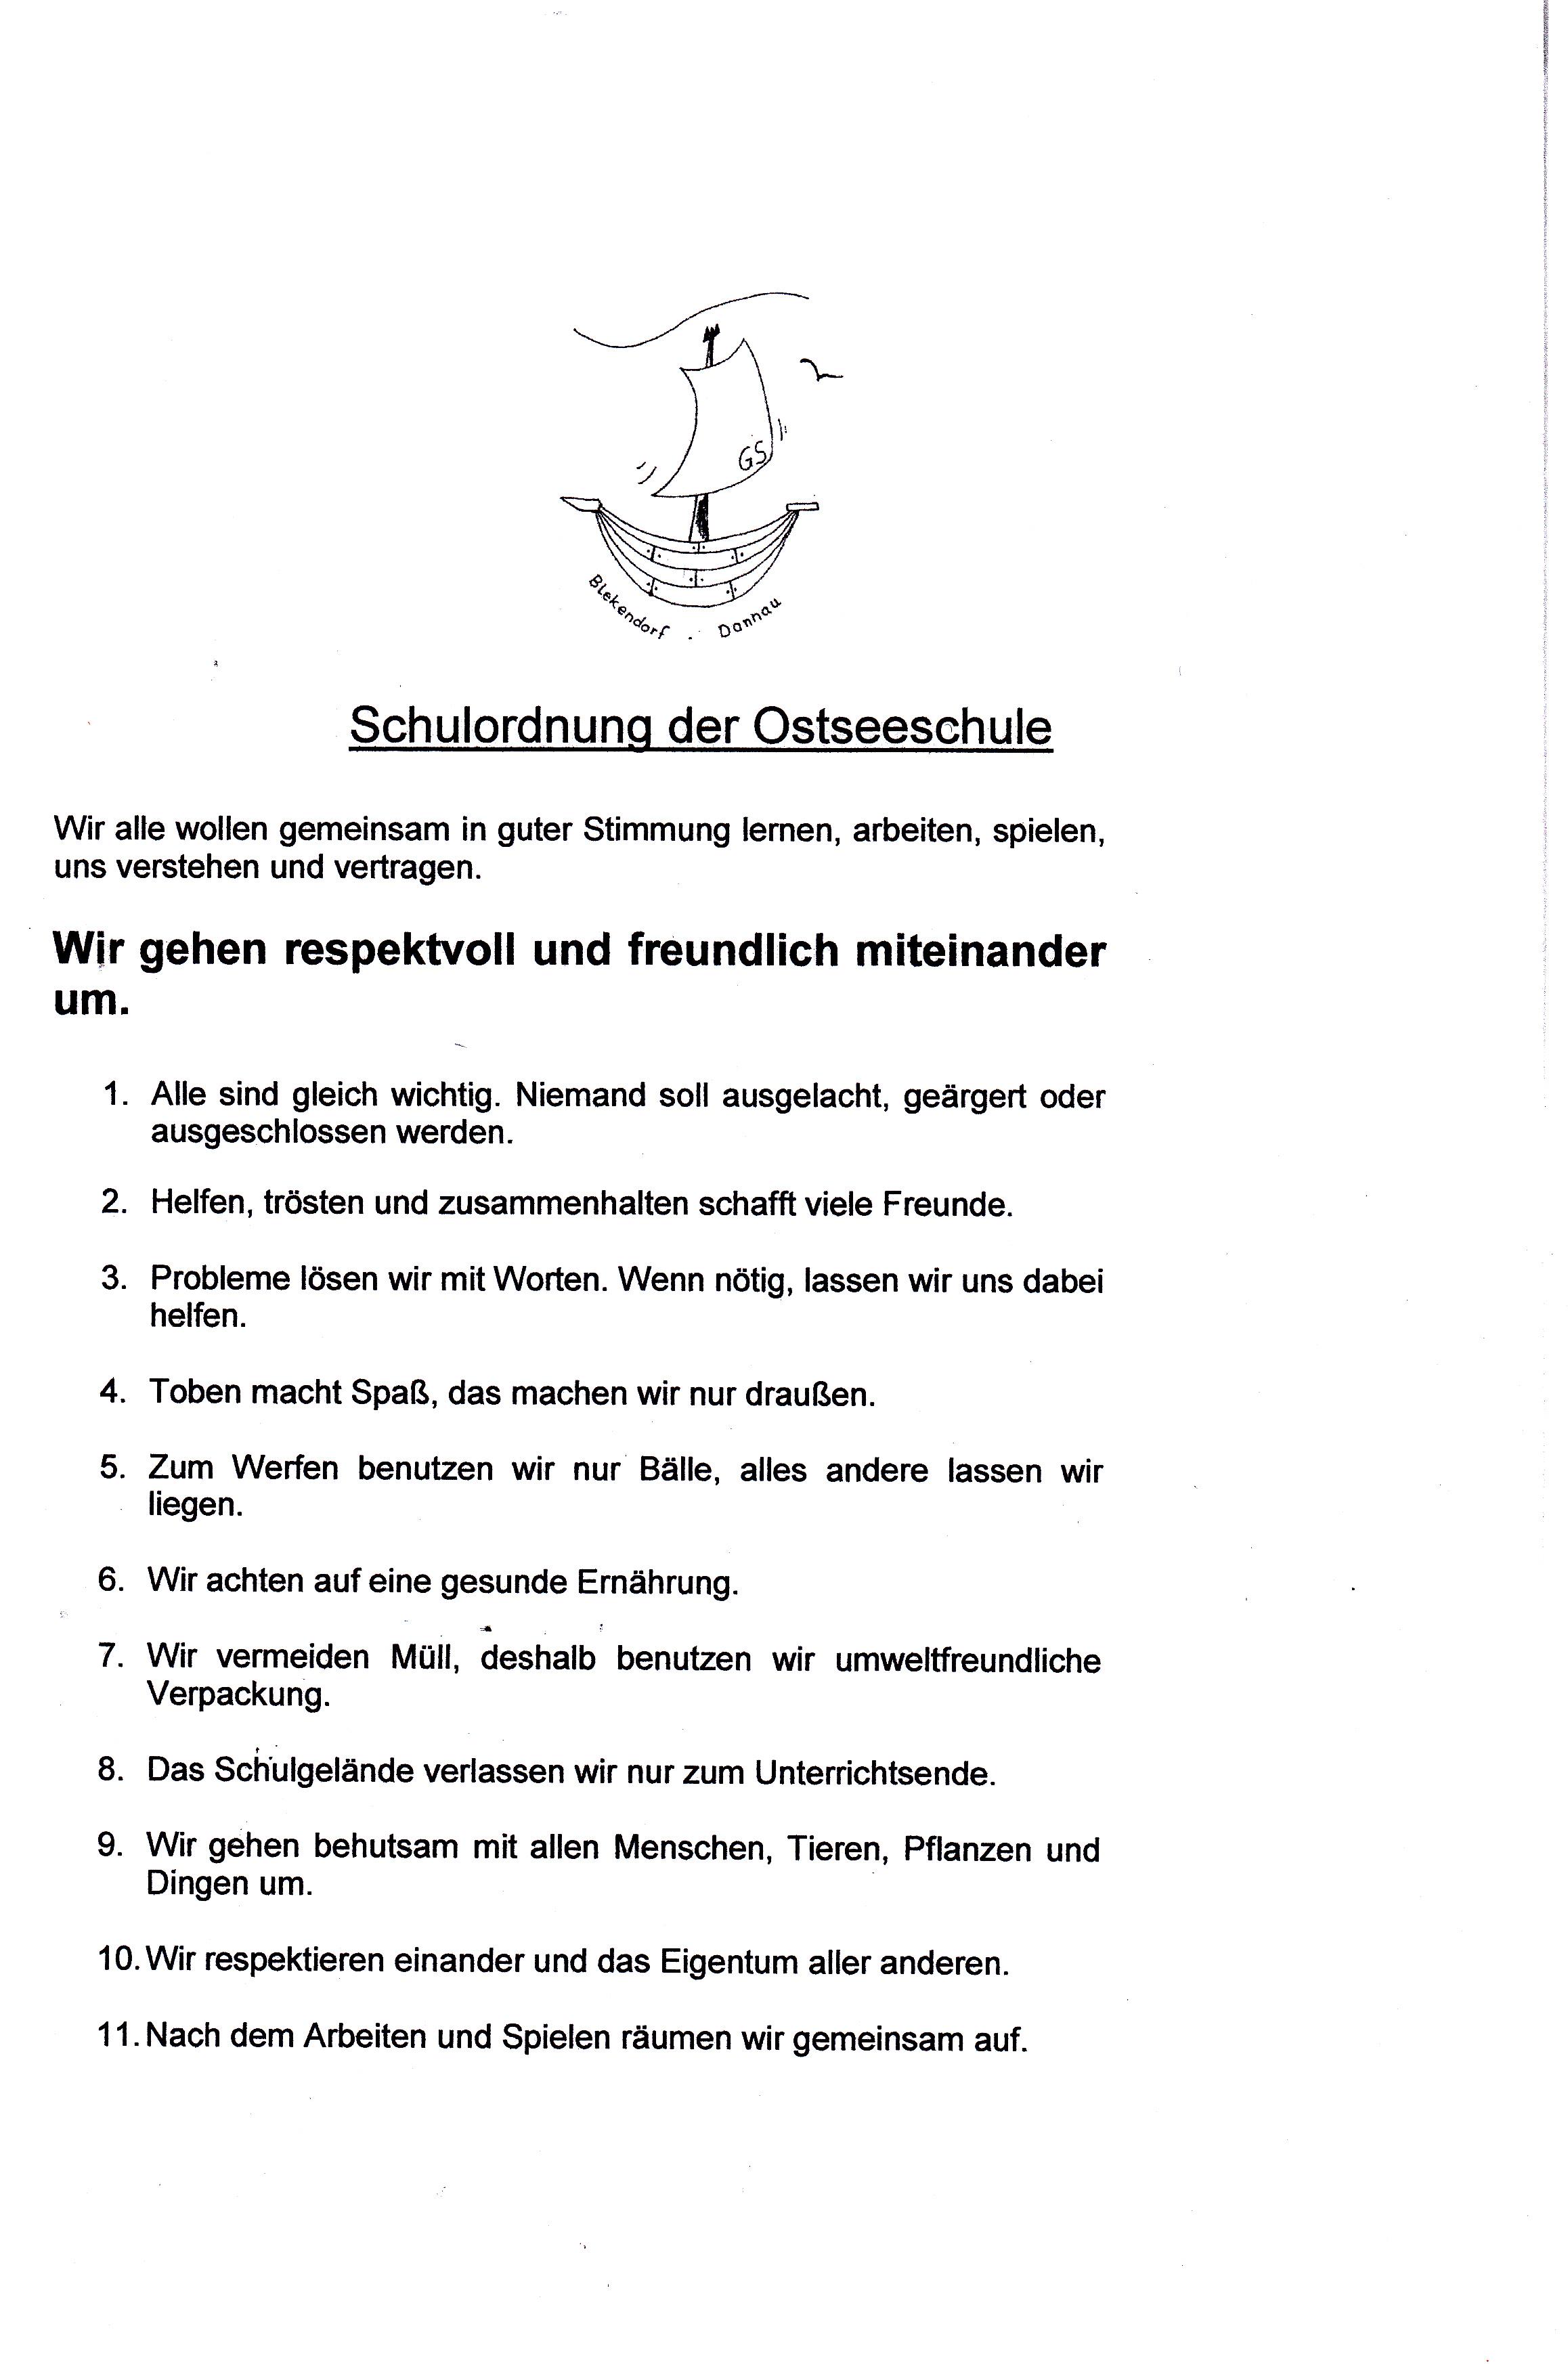 Ostseeschule Blekendorf/Dannau - Downloads der Schule Blekendorf